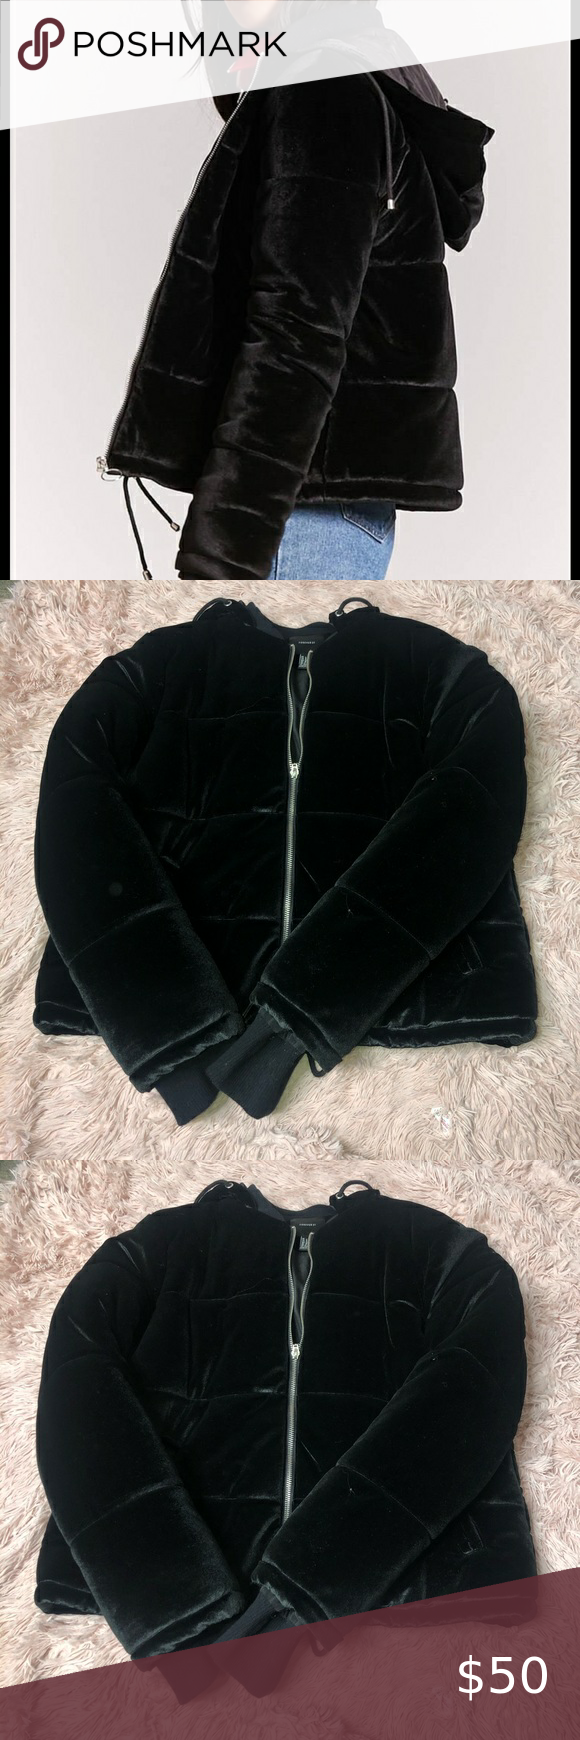 Nwot Black Velvet Puffer Jacket Puffer Jackets Forever 21 Jacket Jackets [ 1740 x 580 Pixel ]